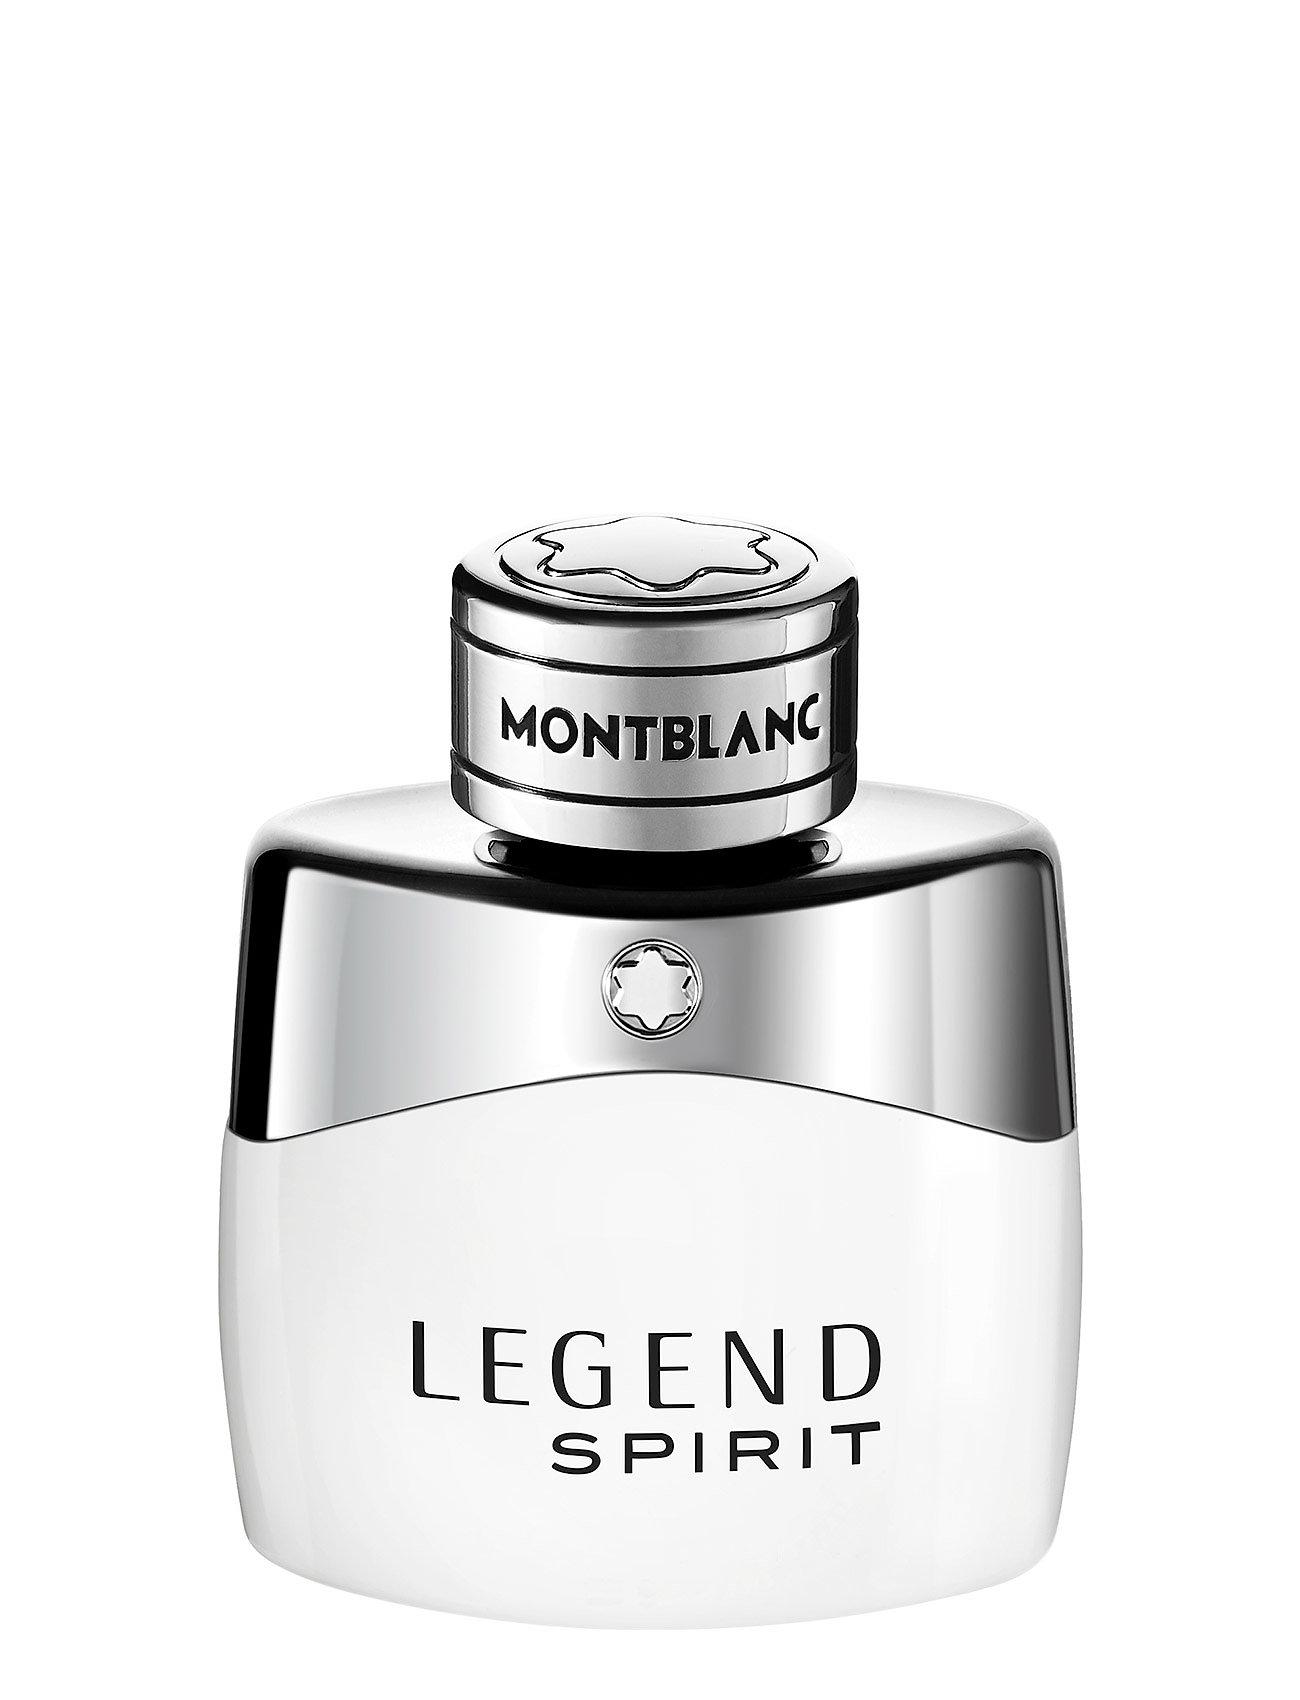 Legend Spirit Eau De Toilette Mont Blanc #I/T til Mænd i Klar